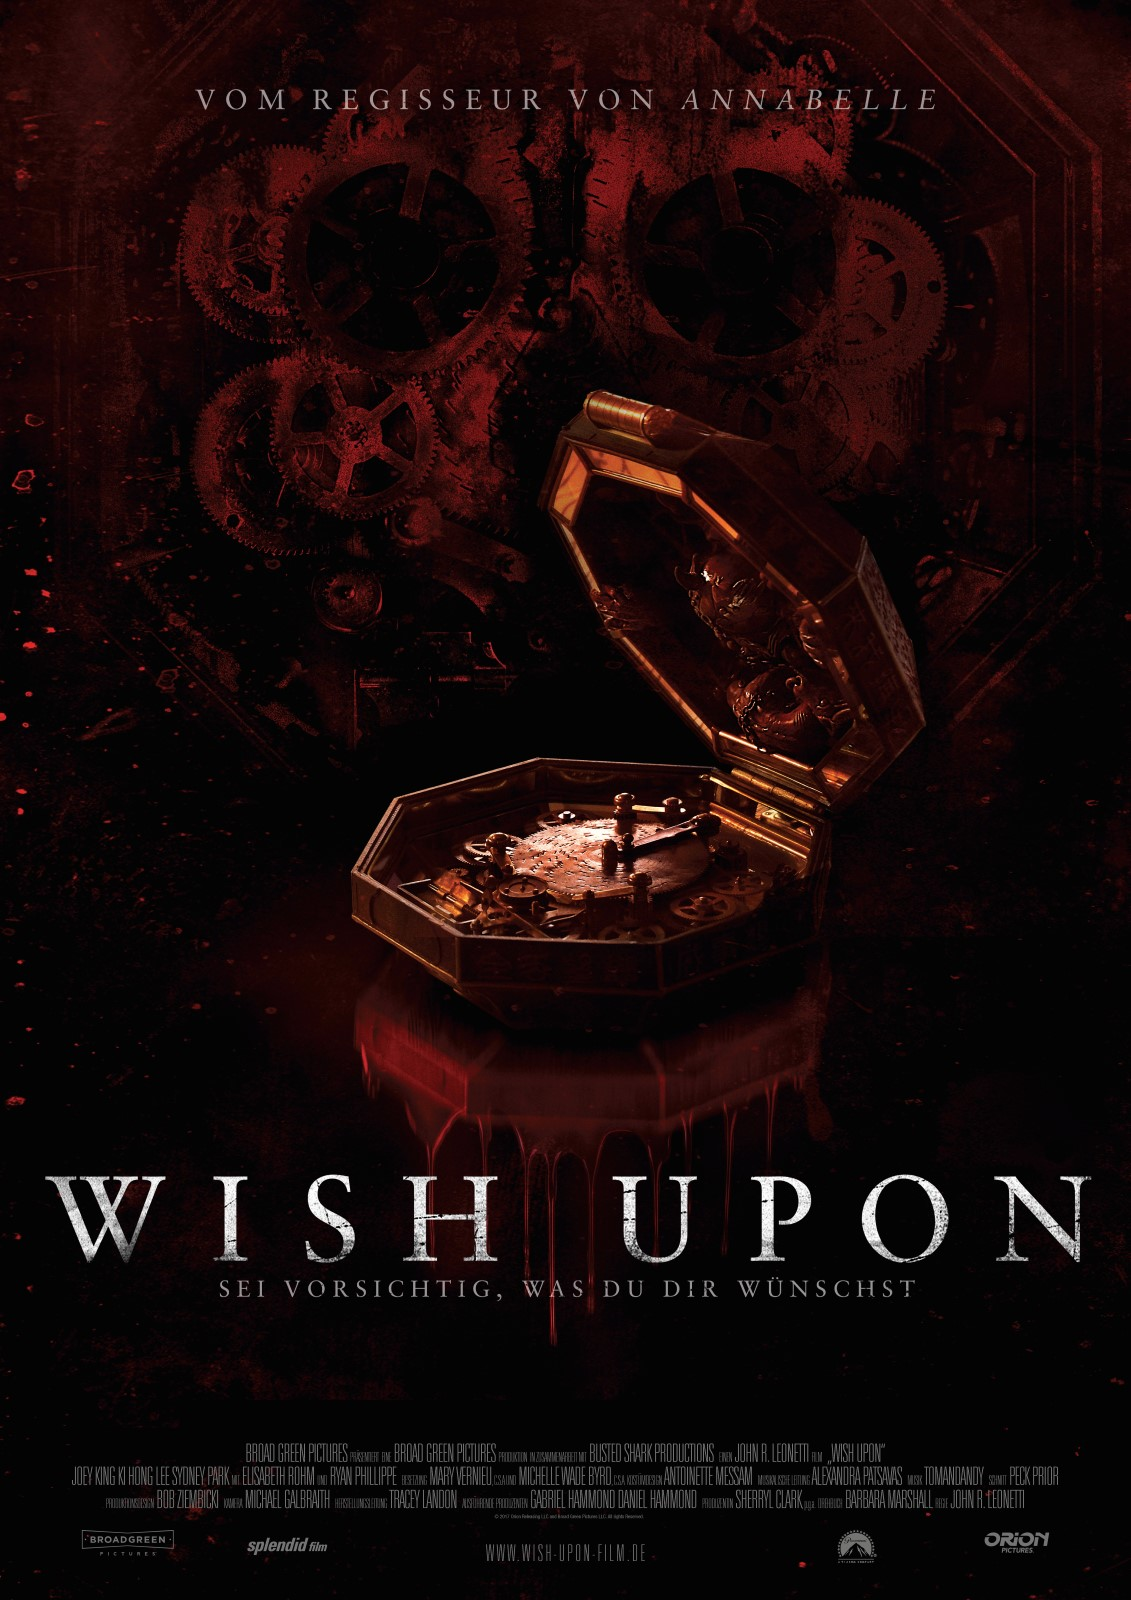 Wish Upon - Film 2017 - FILMSTARTS.de  Wish Upon - Fil...